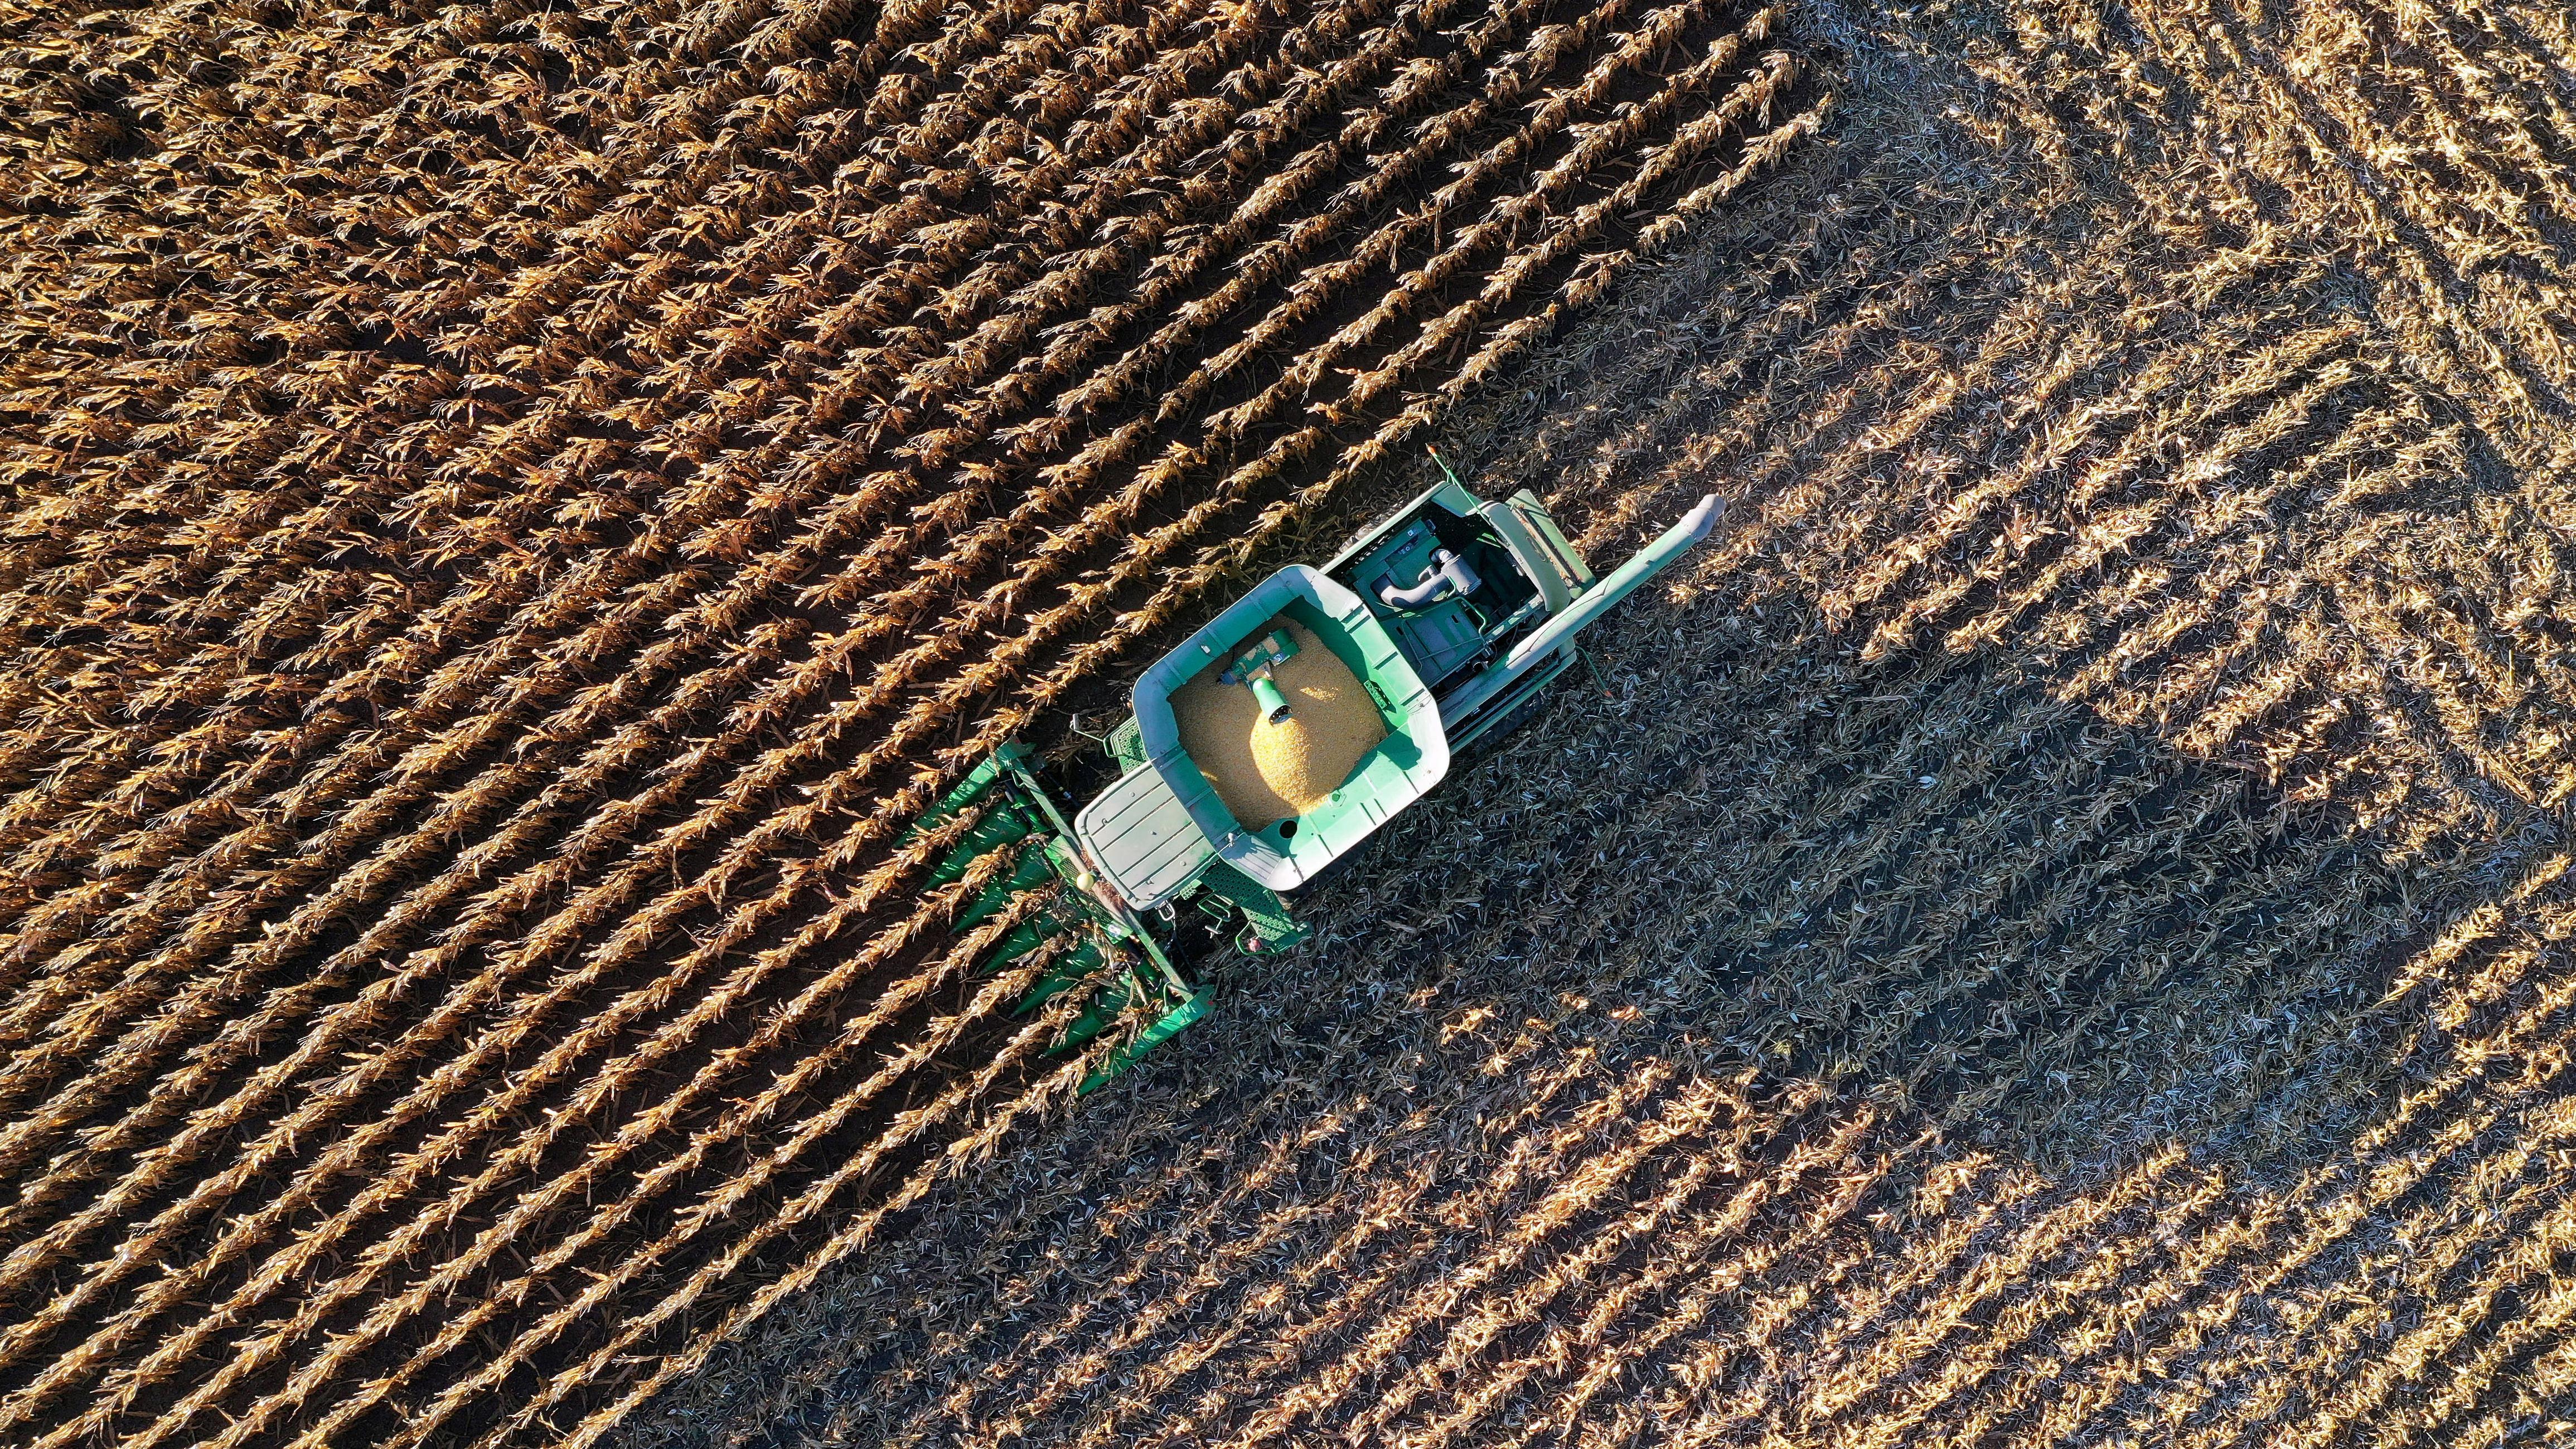 Farmer Roger Hadley harvests corn from his fields in his John Deere combine.